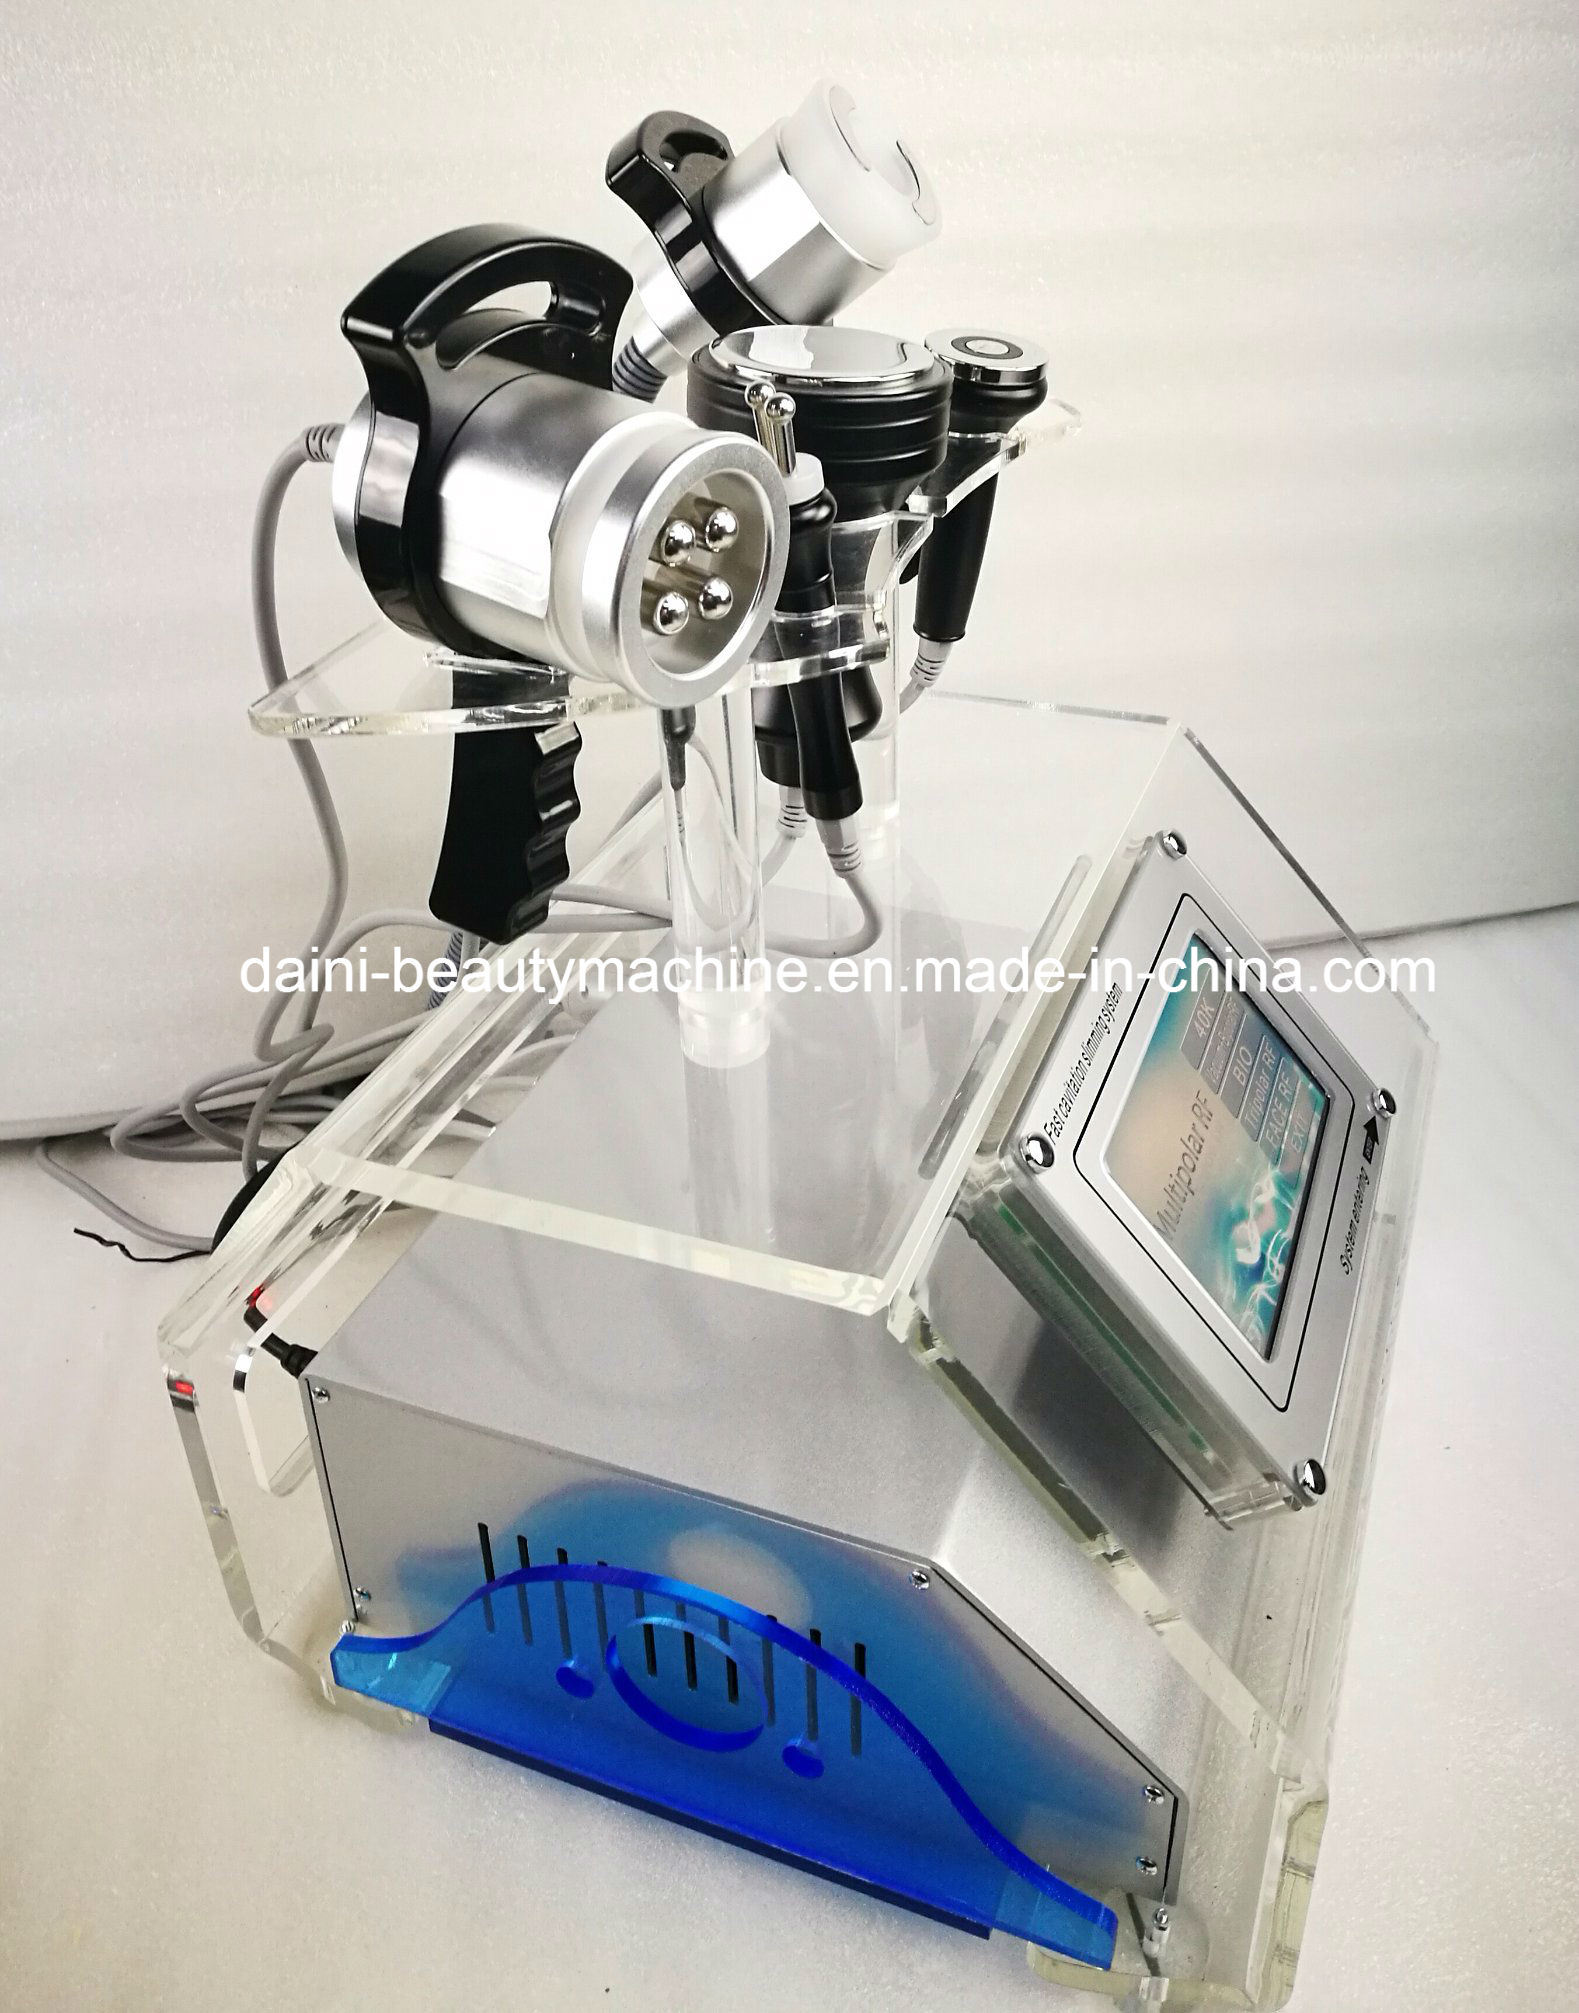 Body Weight Loss Massage Cavitation RF Beauty Vacuum Slimming Machine for Sale